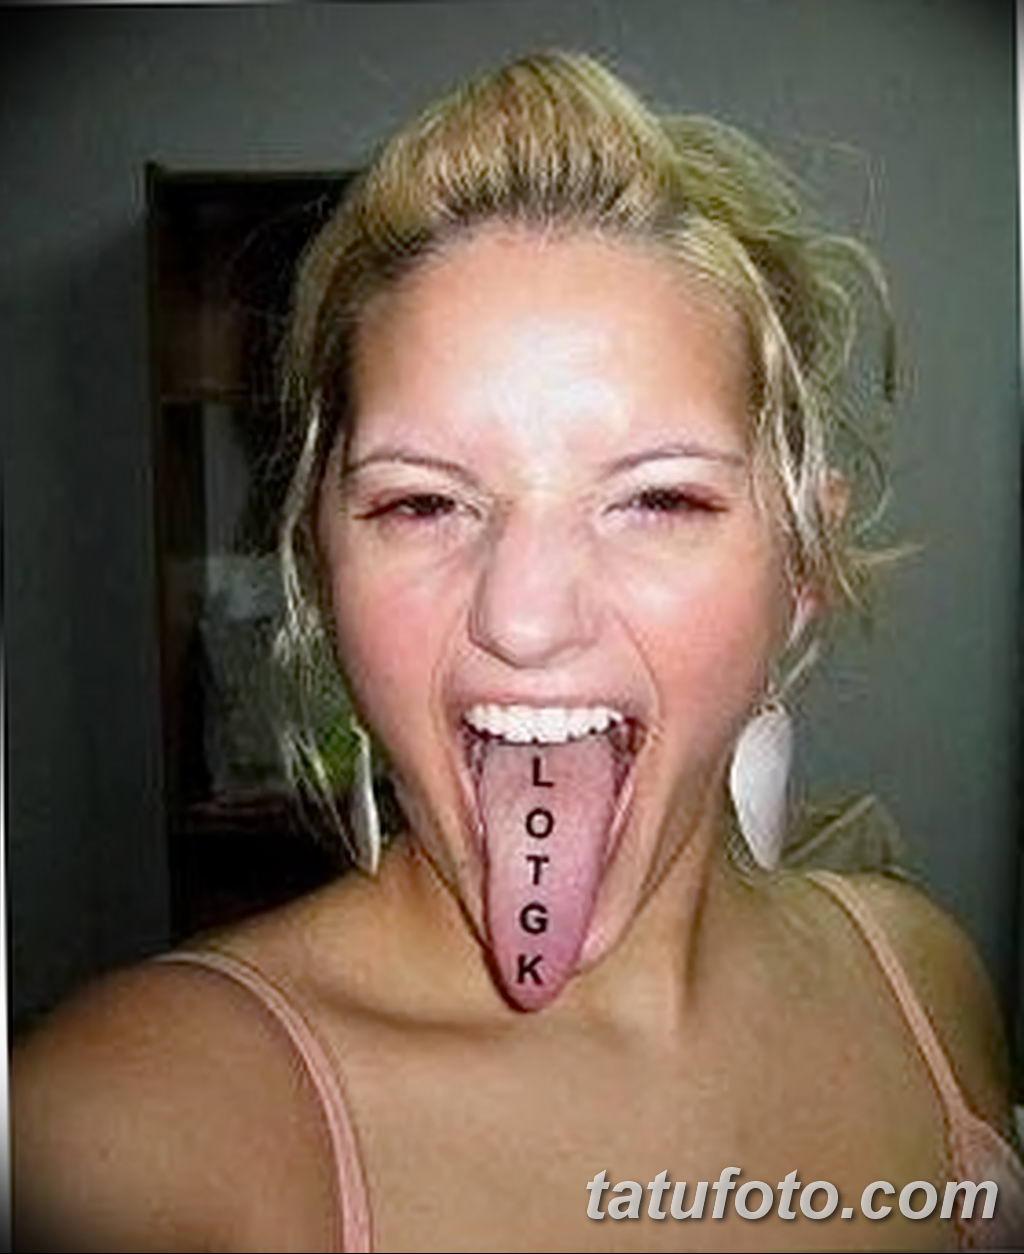 фото фото тату на языке 15.12.2018 №009 - tongue tattoo photo - tatufoto.com